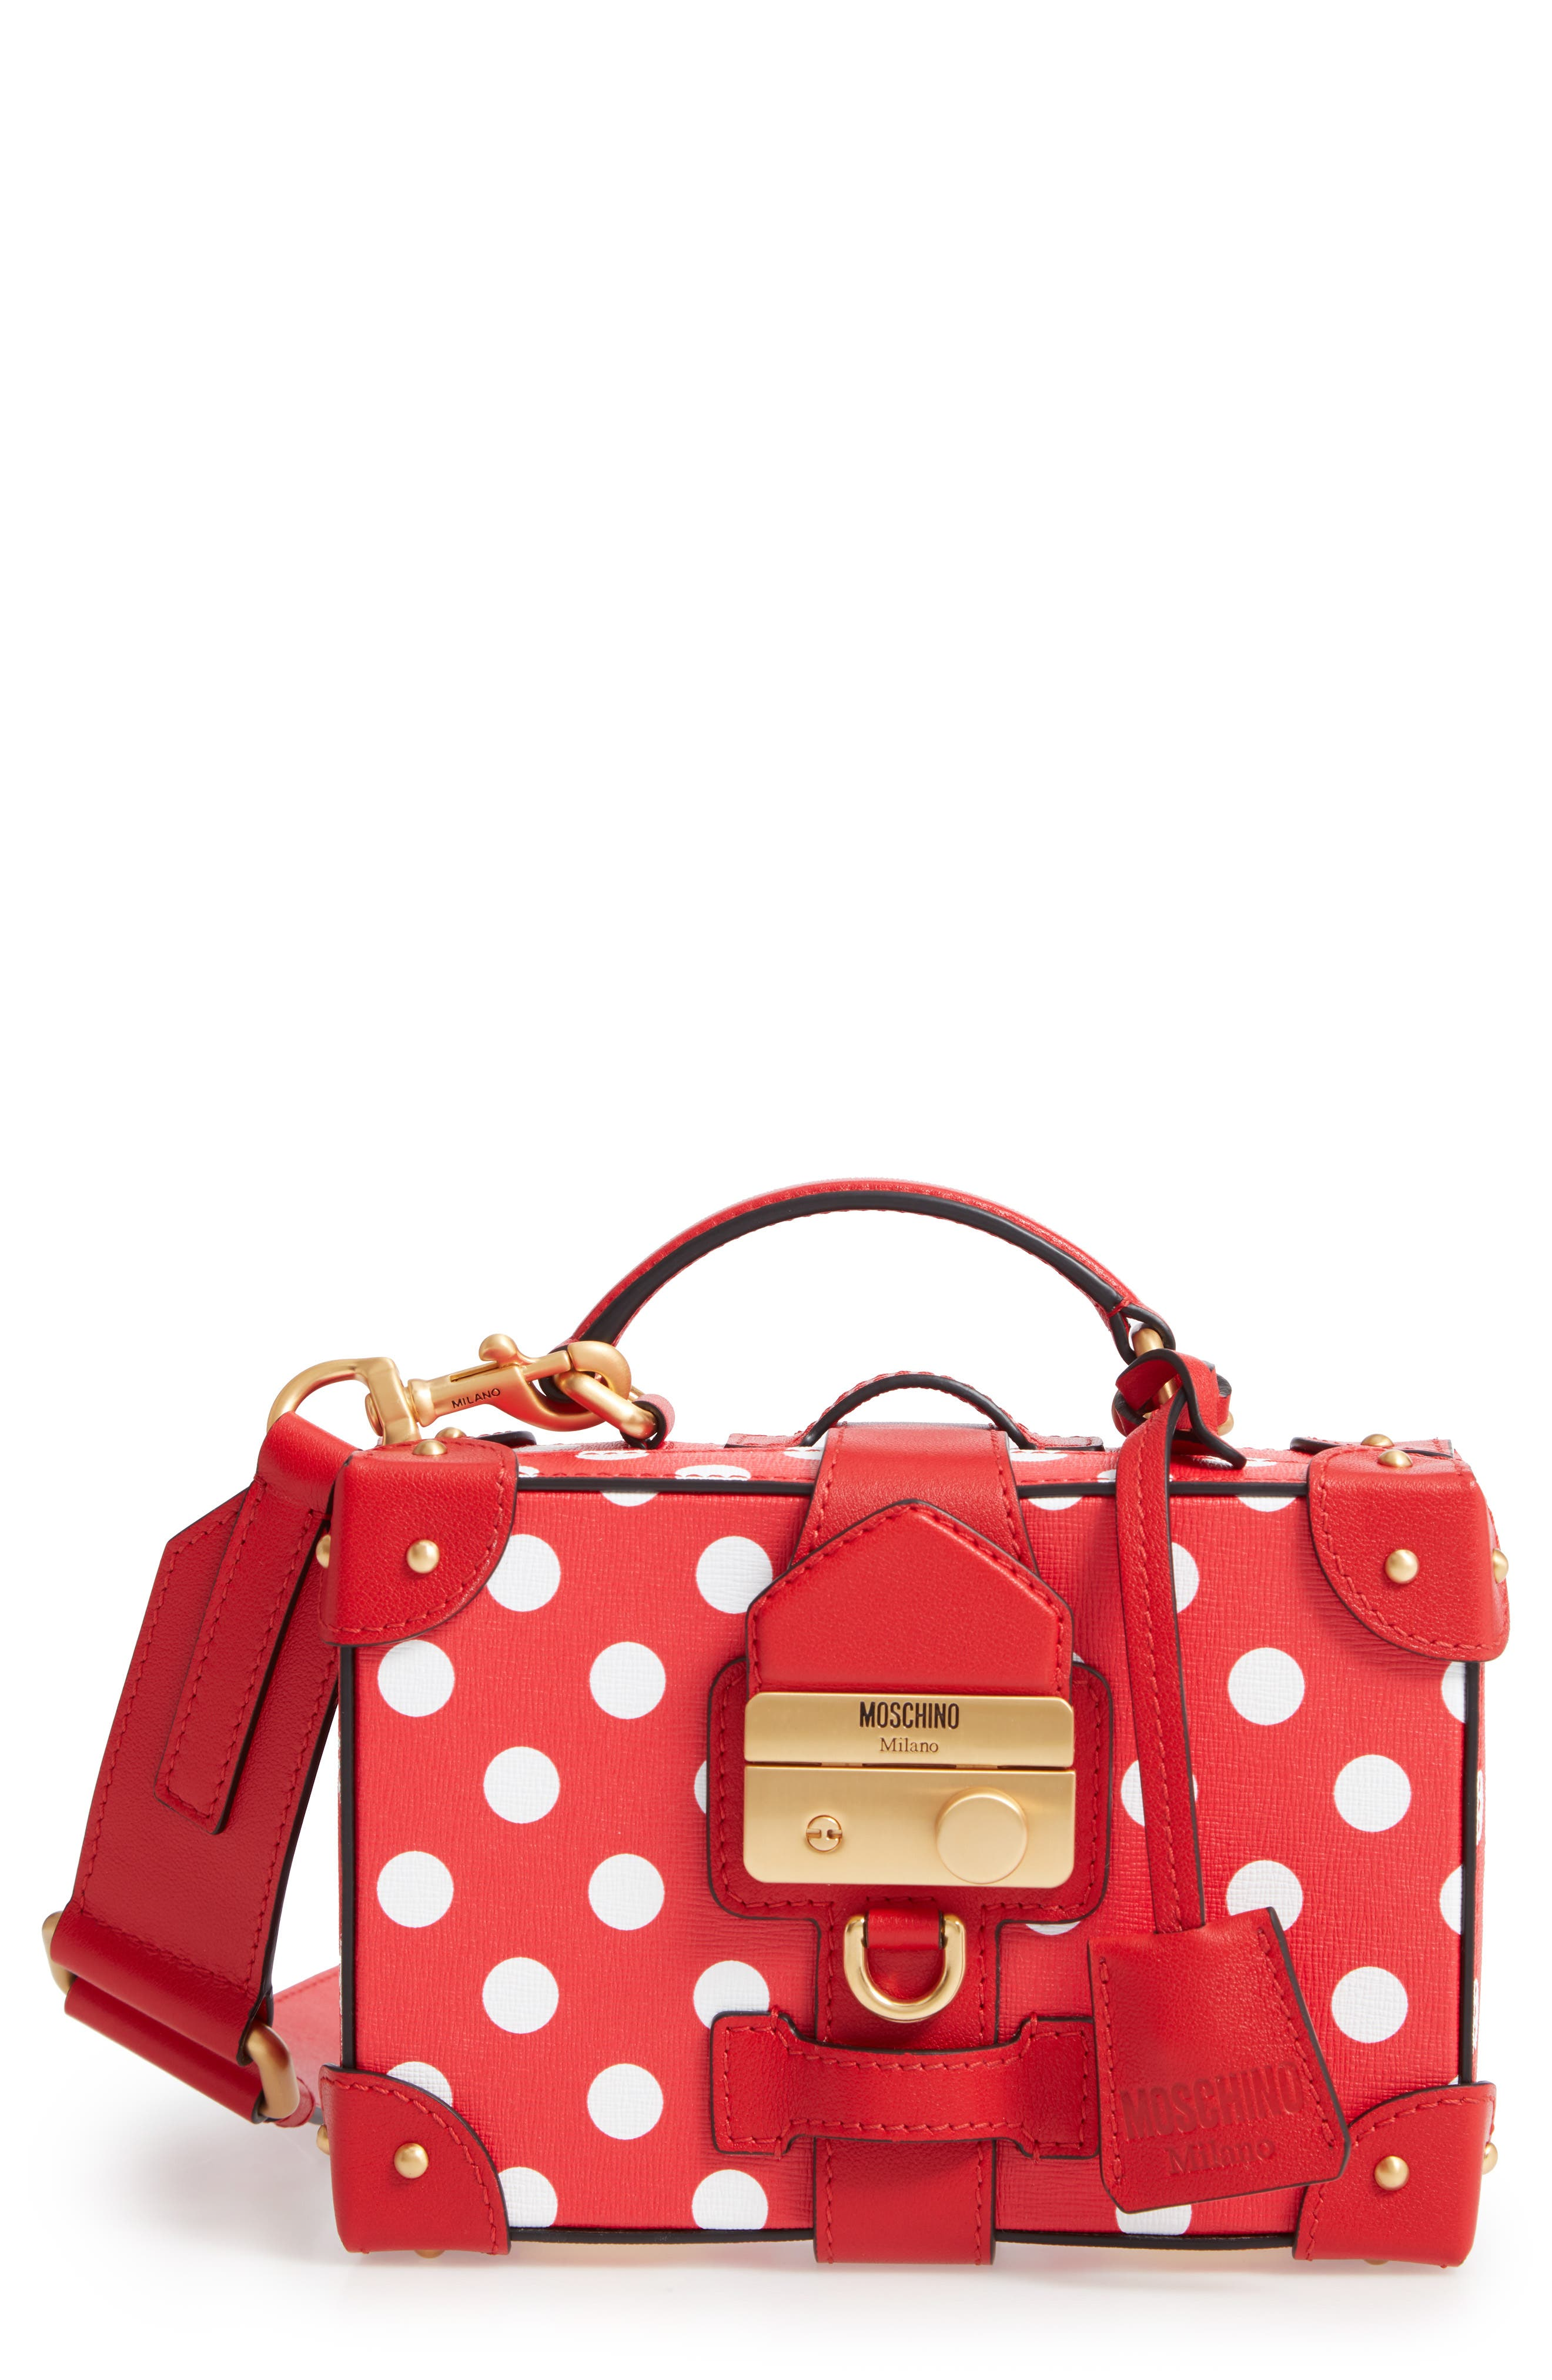 MOSCHINO, Polka Dot Box Leather Crossbody Bag, Main thumbnail 1, color, RED